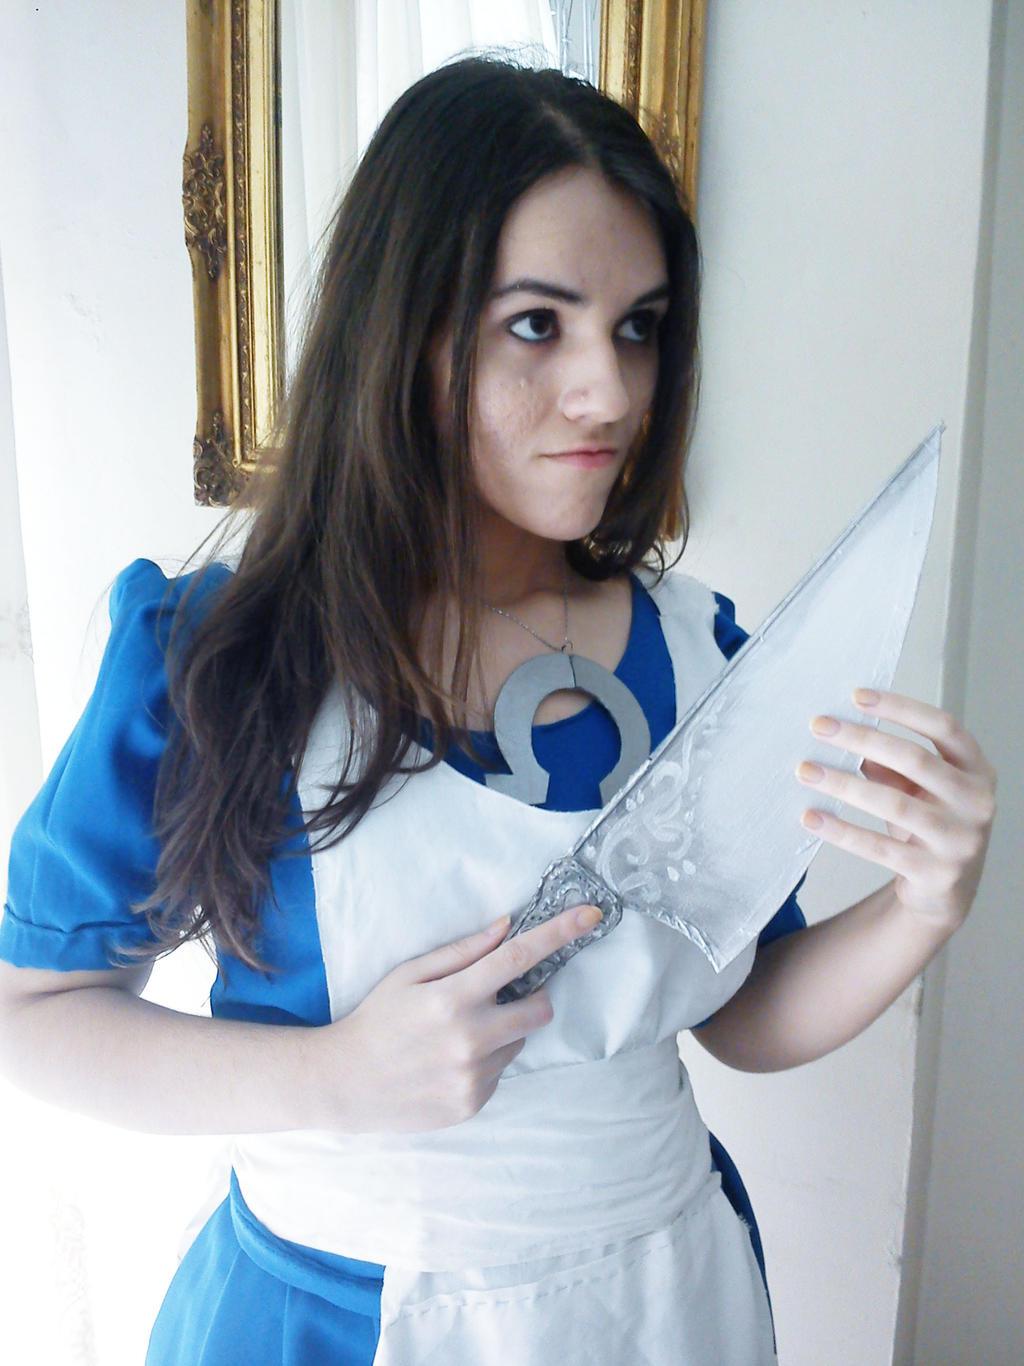 Vorpal Blade by Lillyka